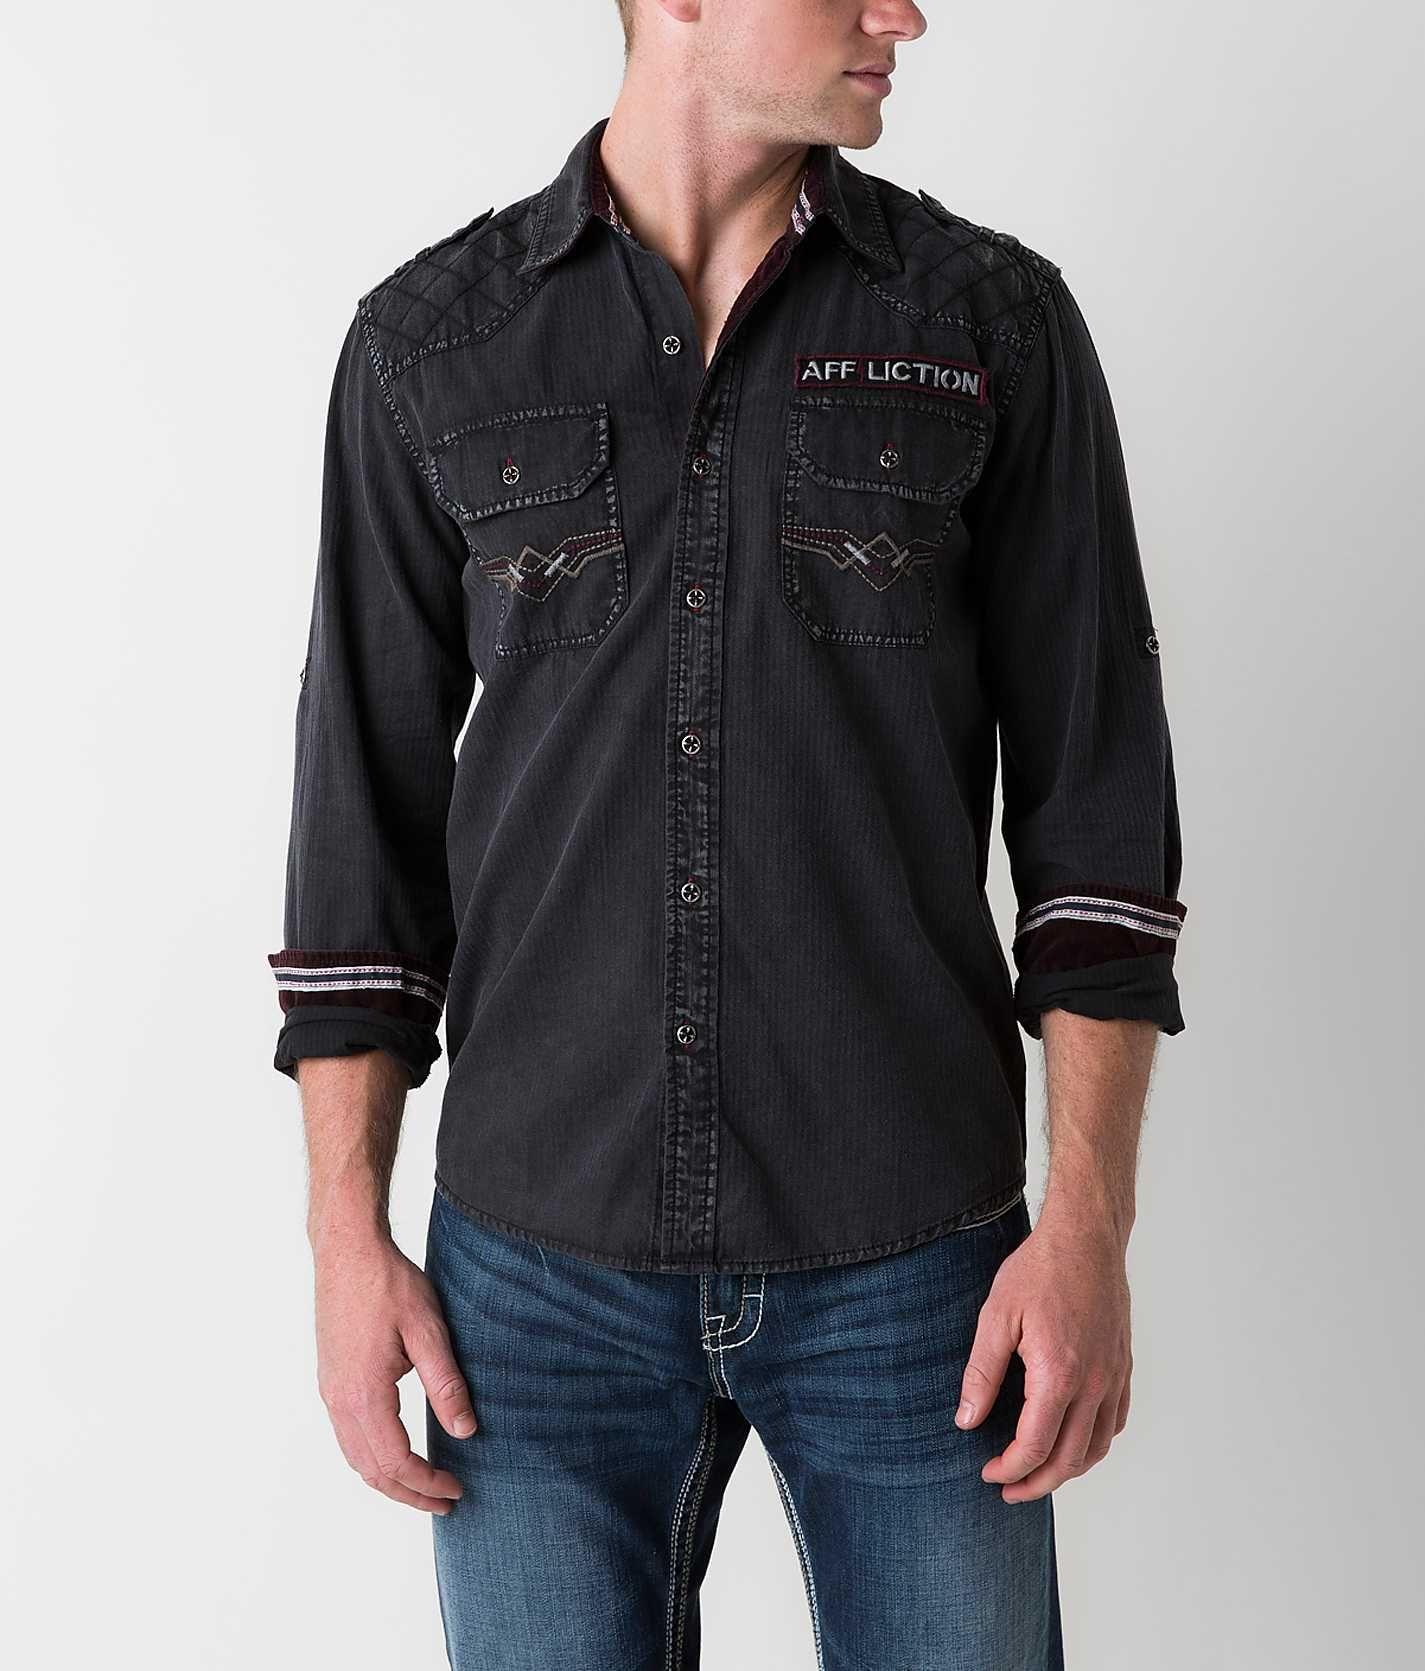 Affliction Black Premium Abandon City Shirt Men's Shirts